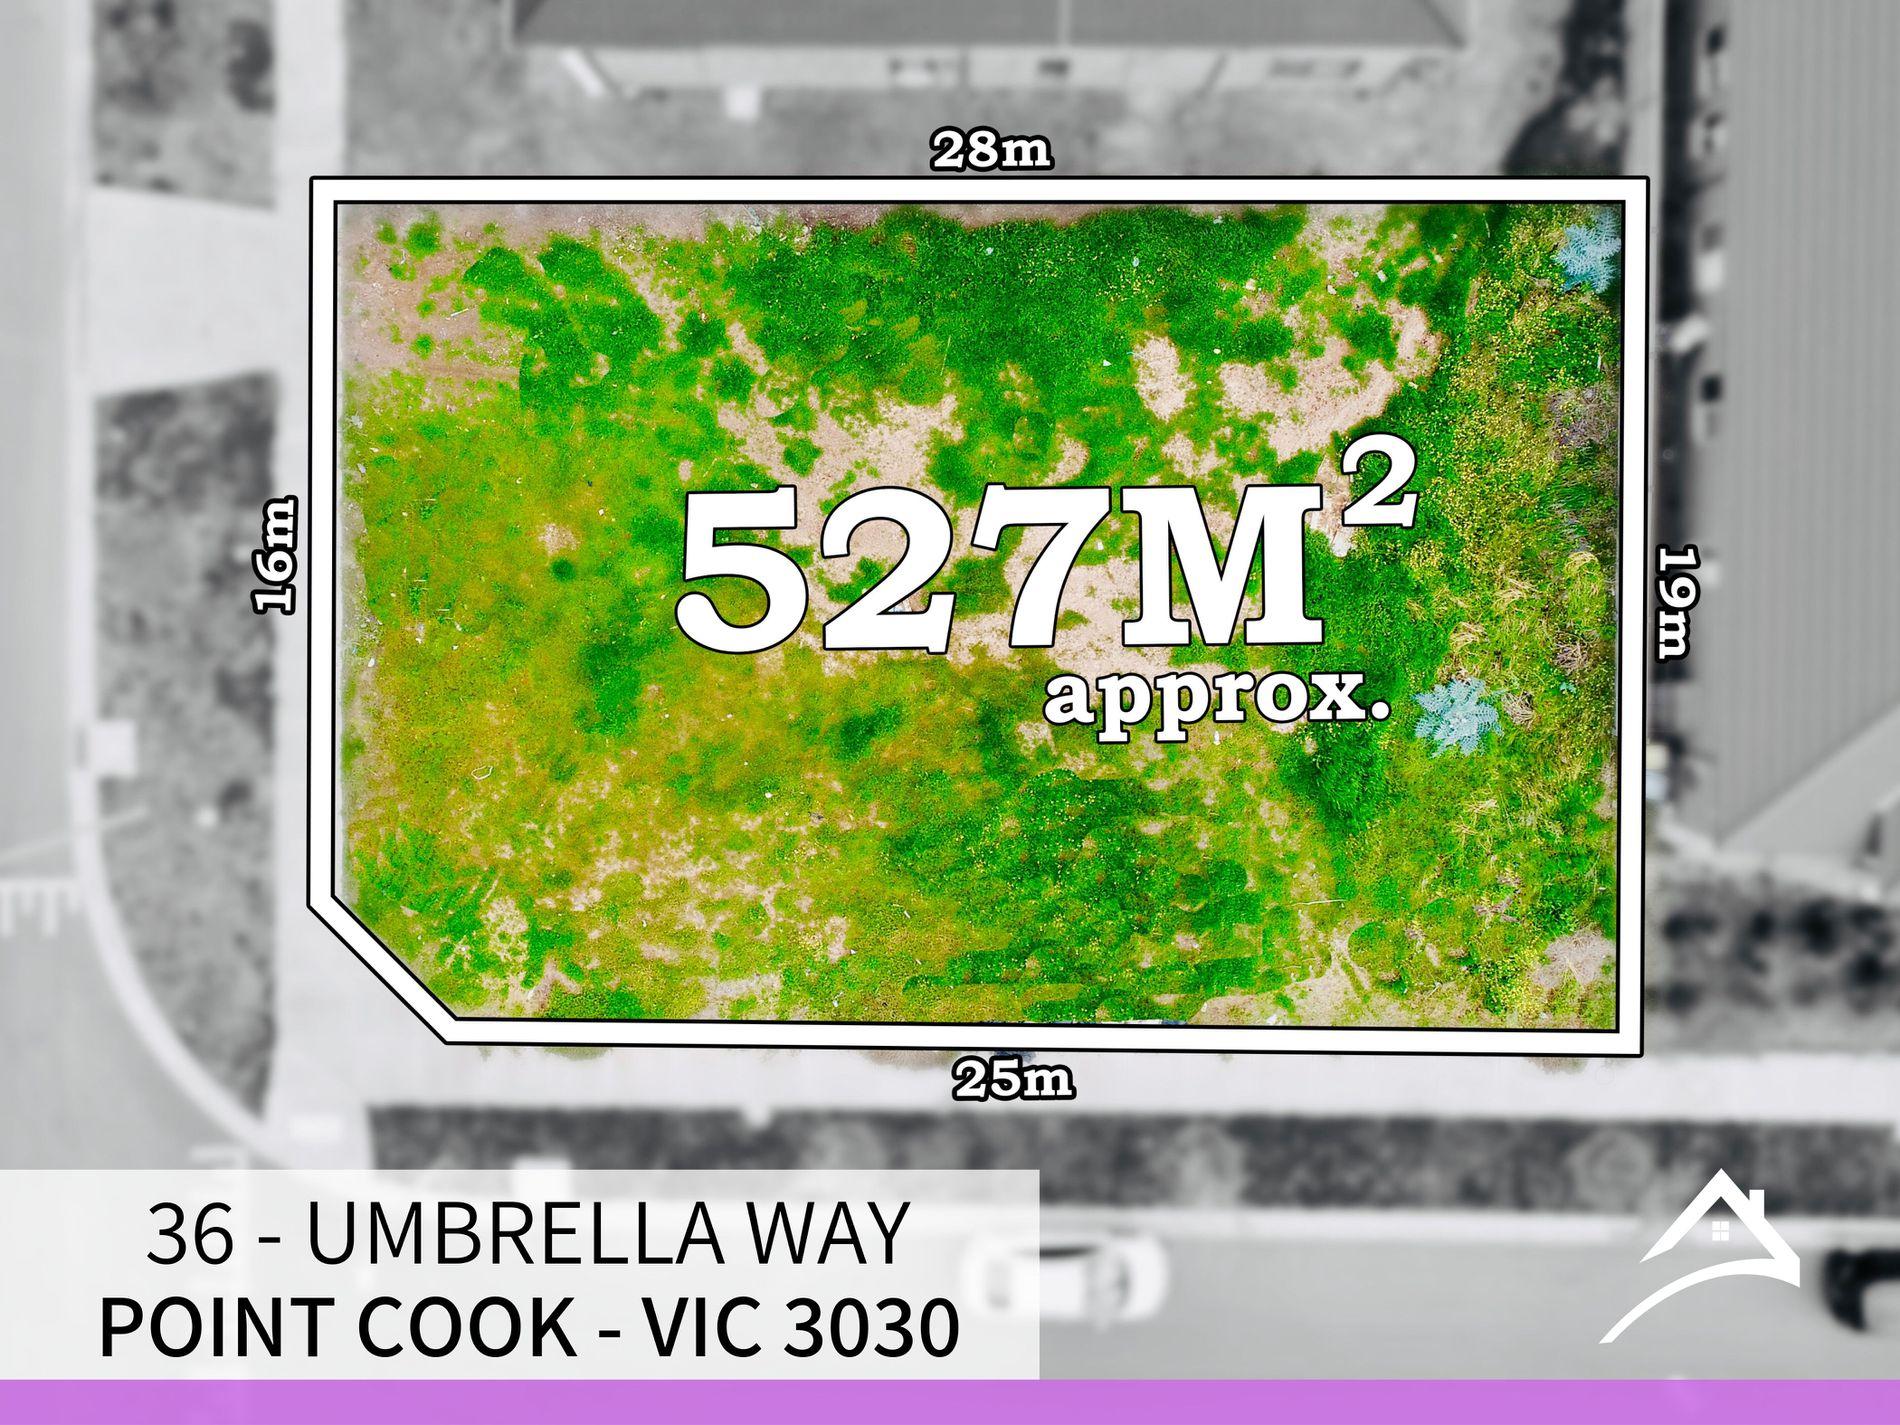 36 Umbrella Way, Point Cook